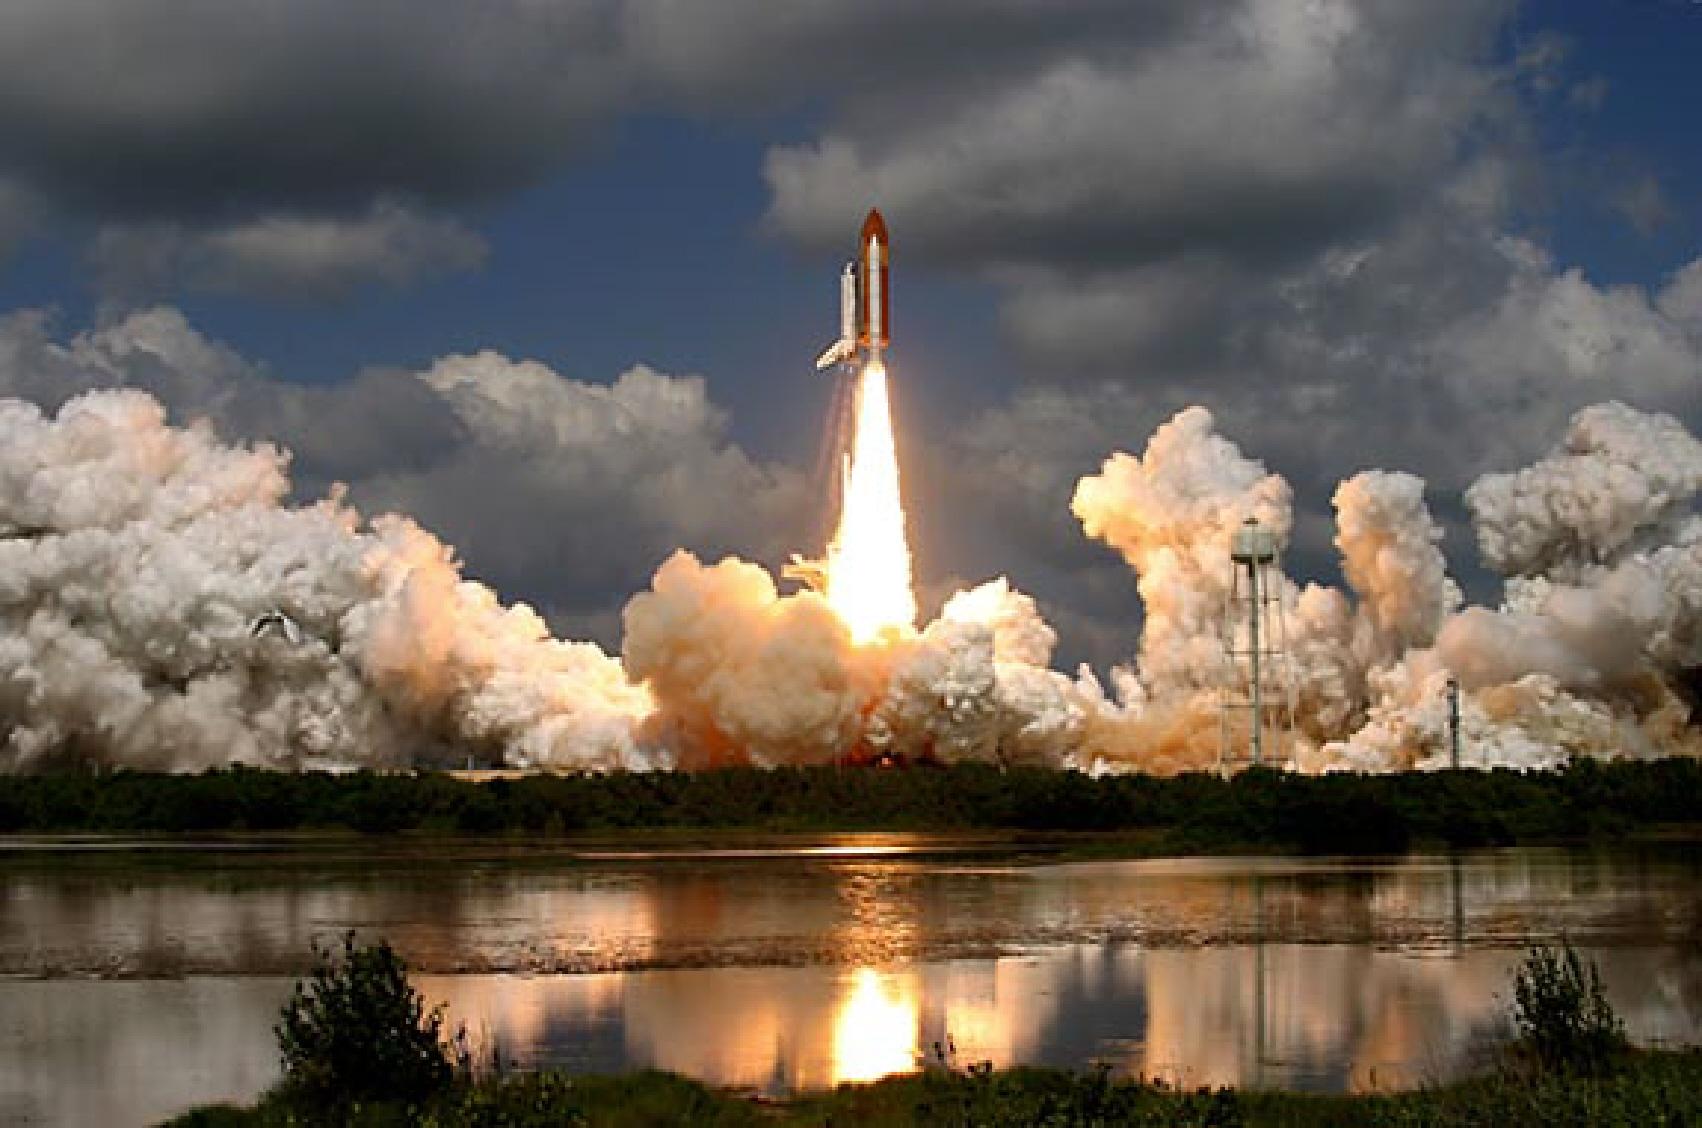 space shuttle landing in houston - photo #26